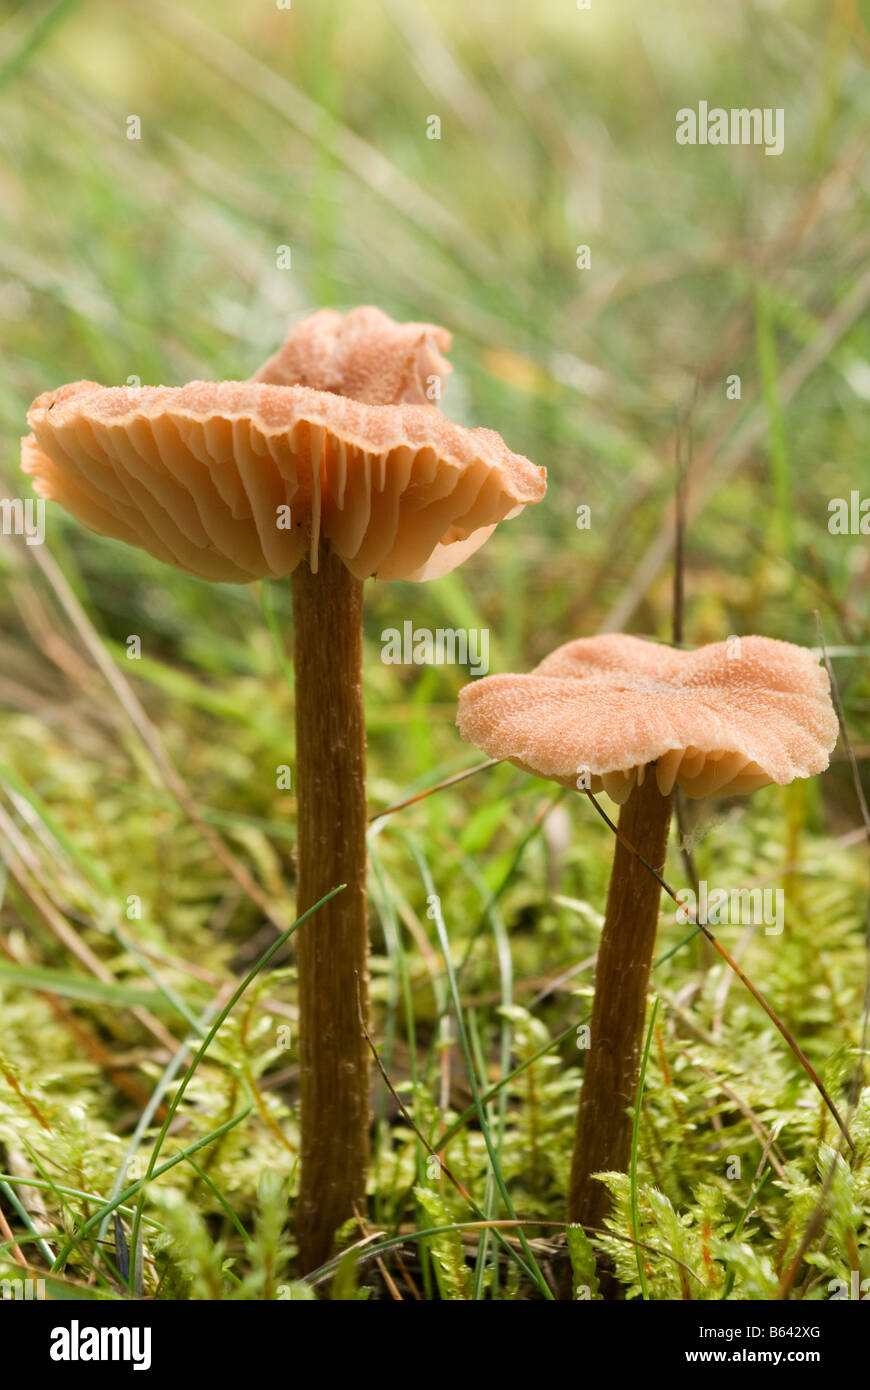 fungus sp. - Stock Image